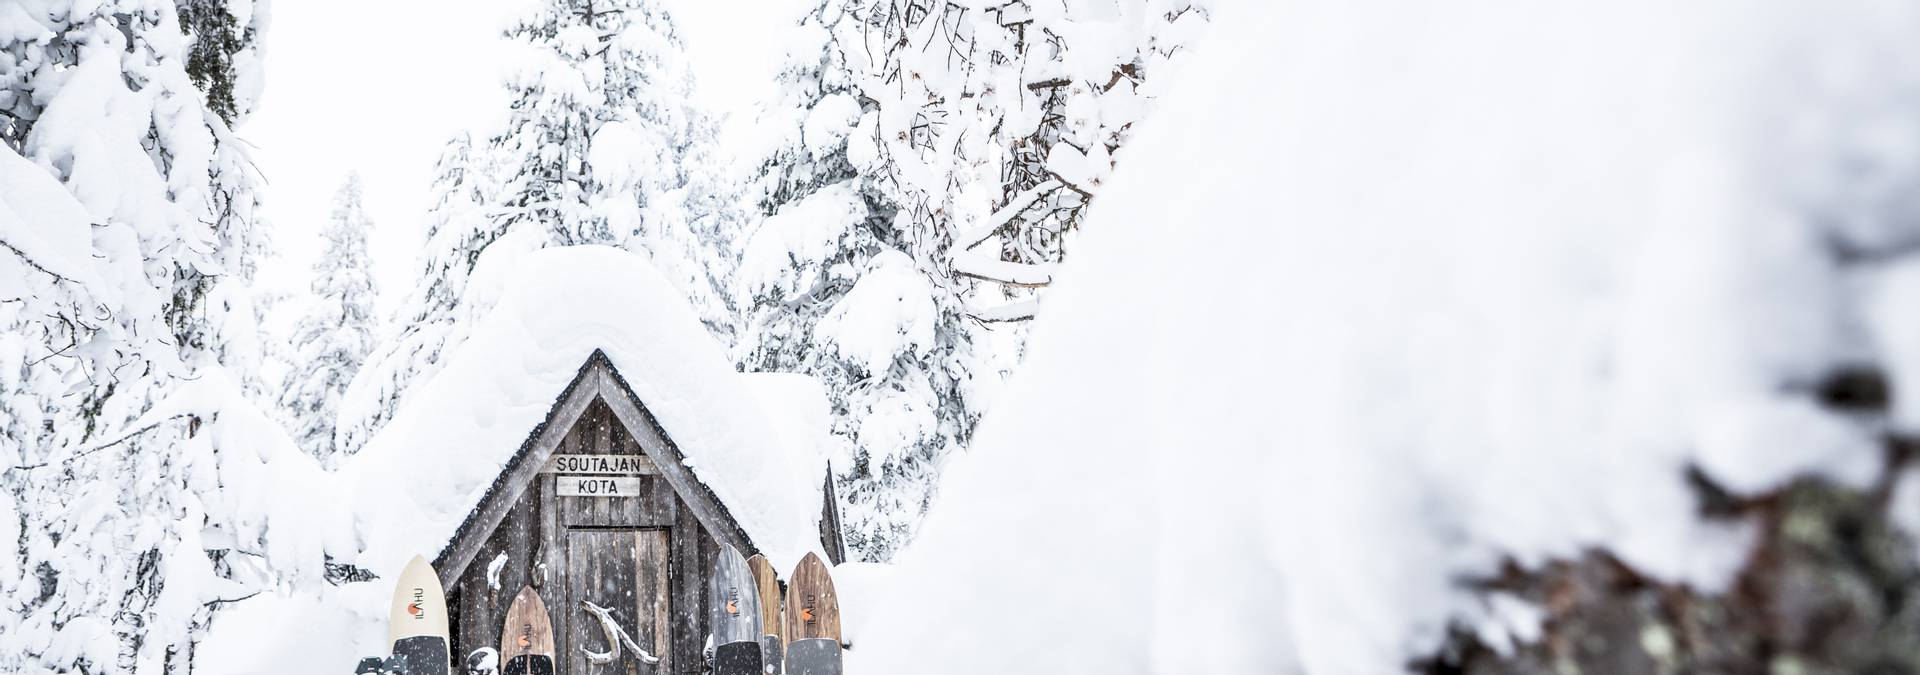 Finland_Lapland_Ilahu-JaniKarppaPhoto_snowsurfing Credit Jani Kärppä.jpg